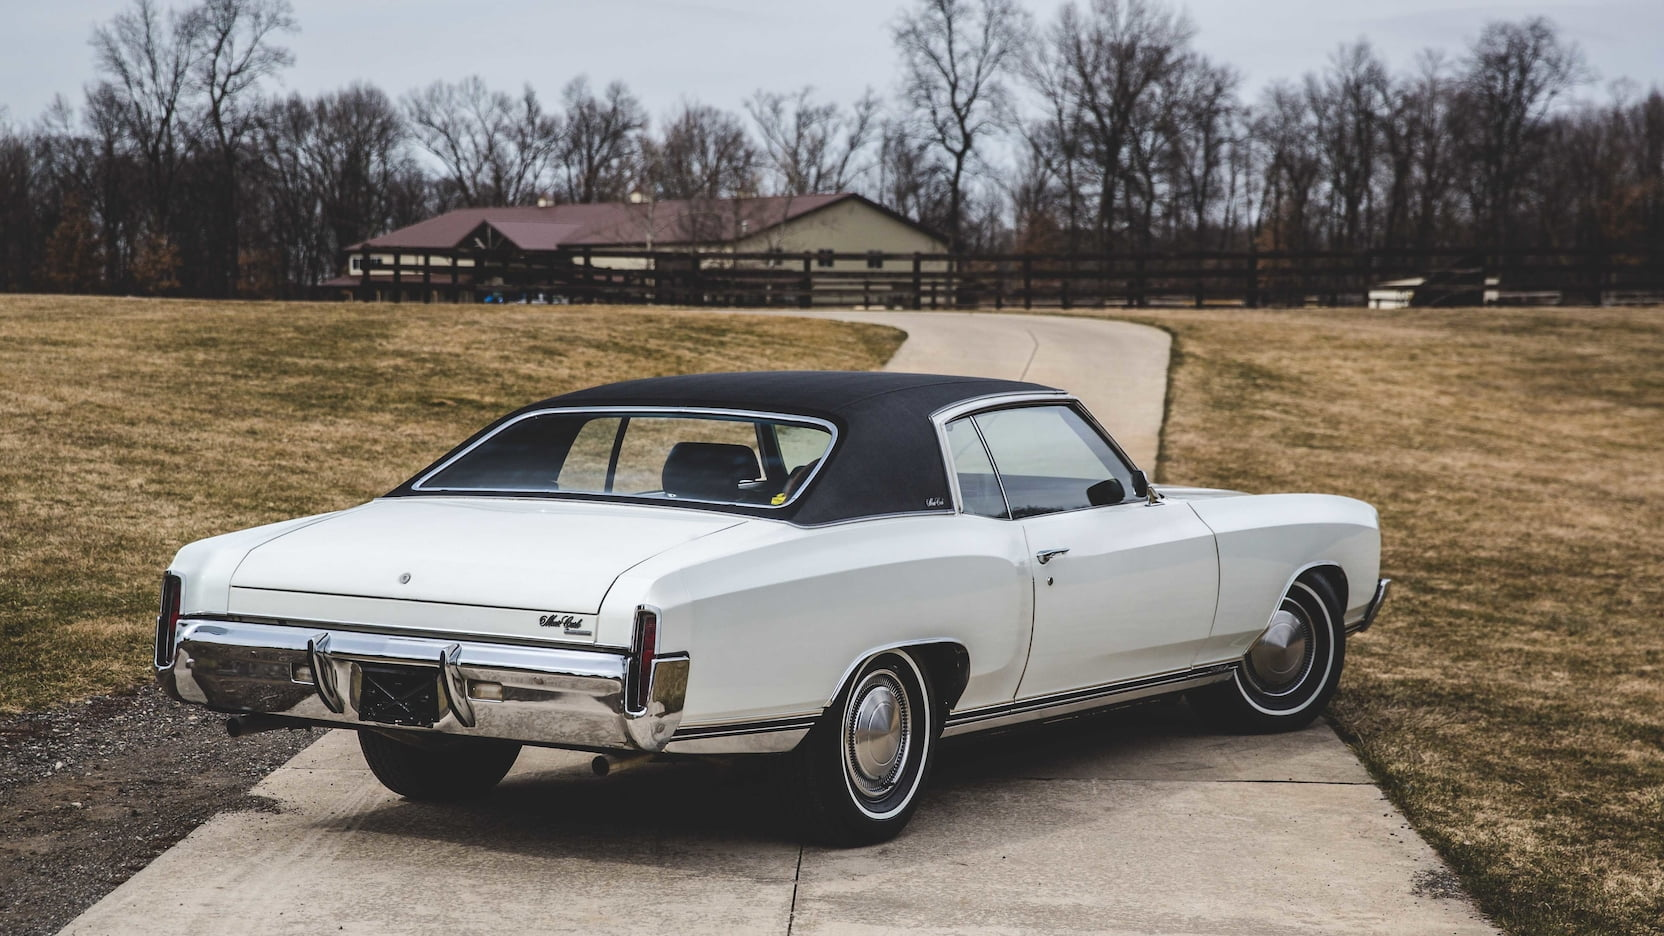 1970 Monte Carlo SS rear